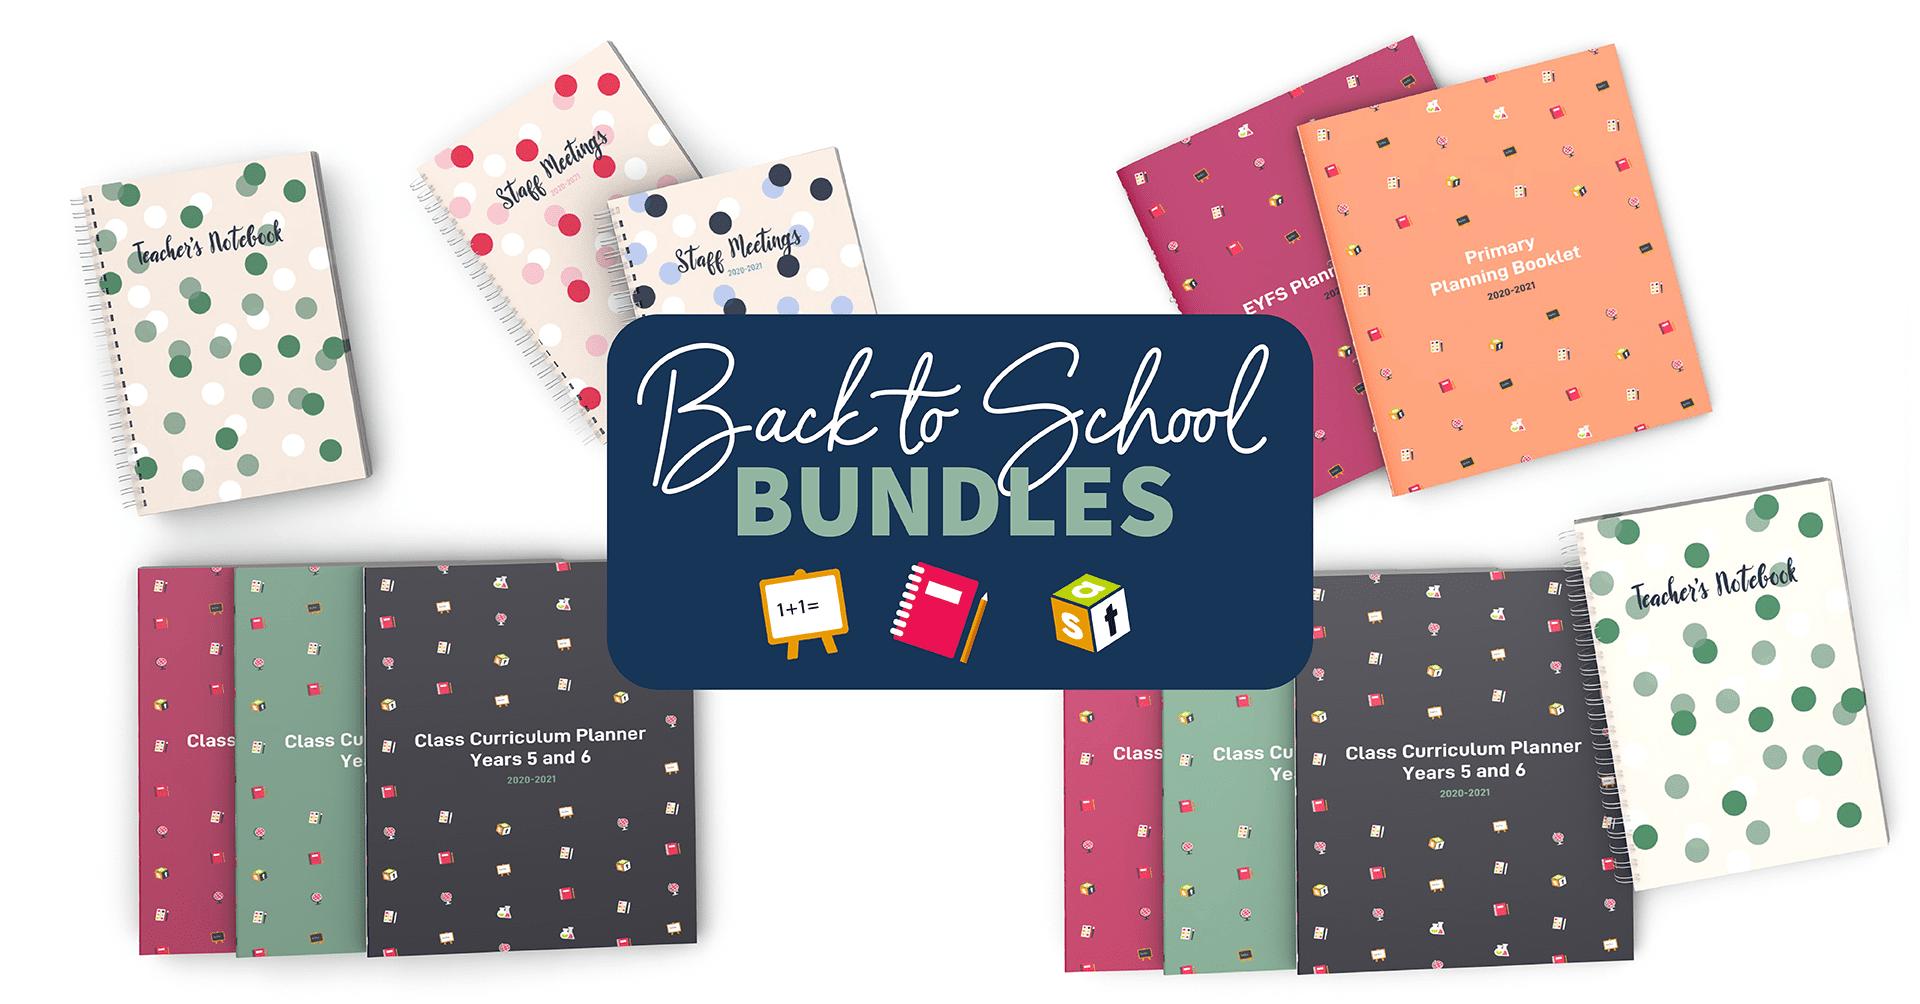 Back to School Bundle Web Banner